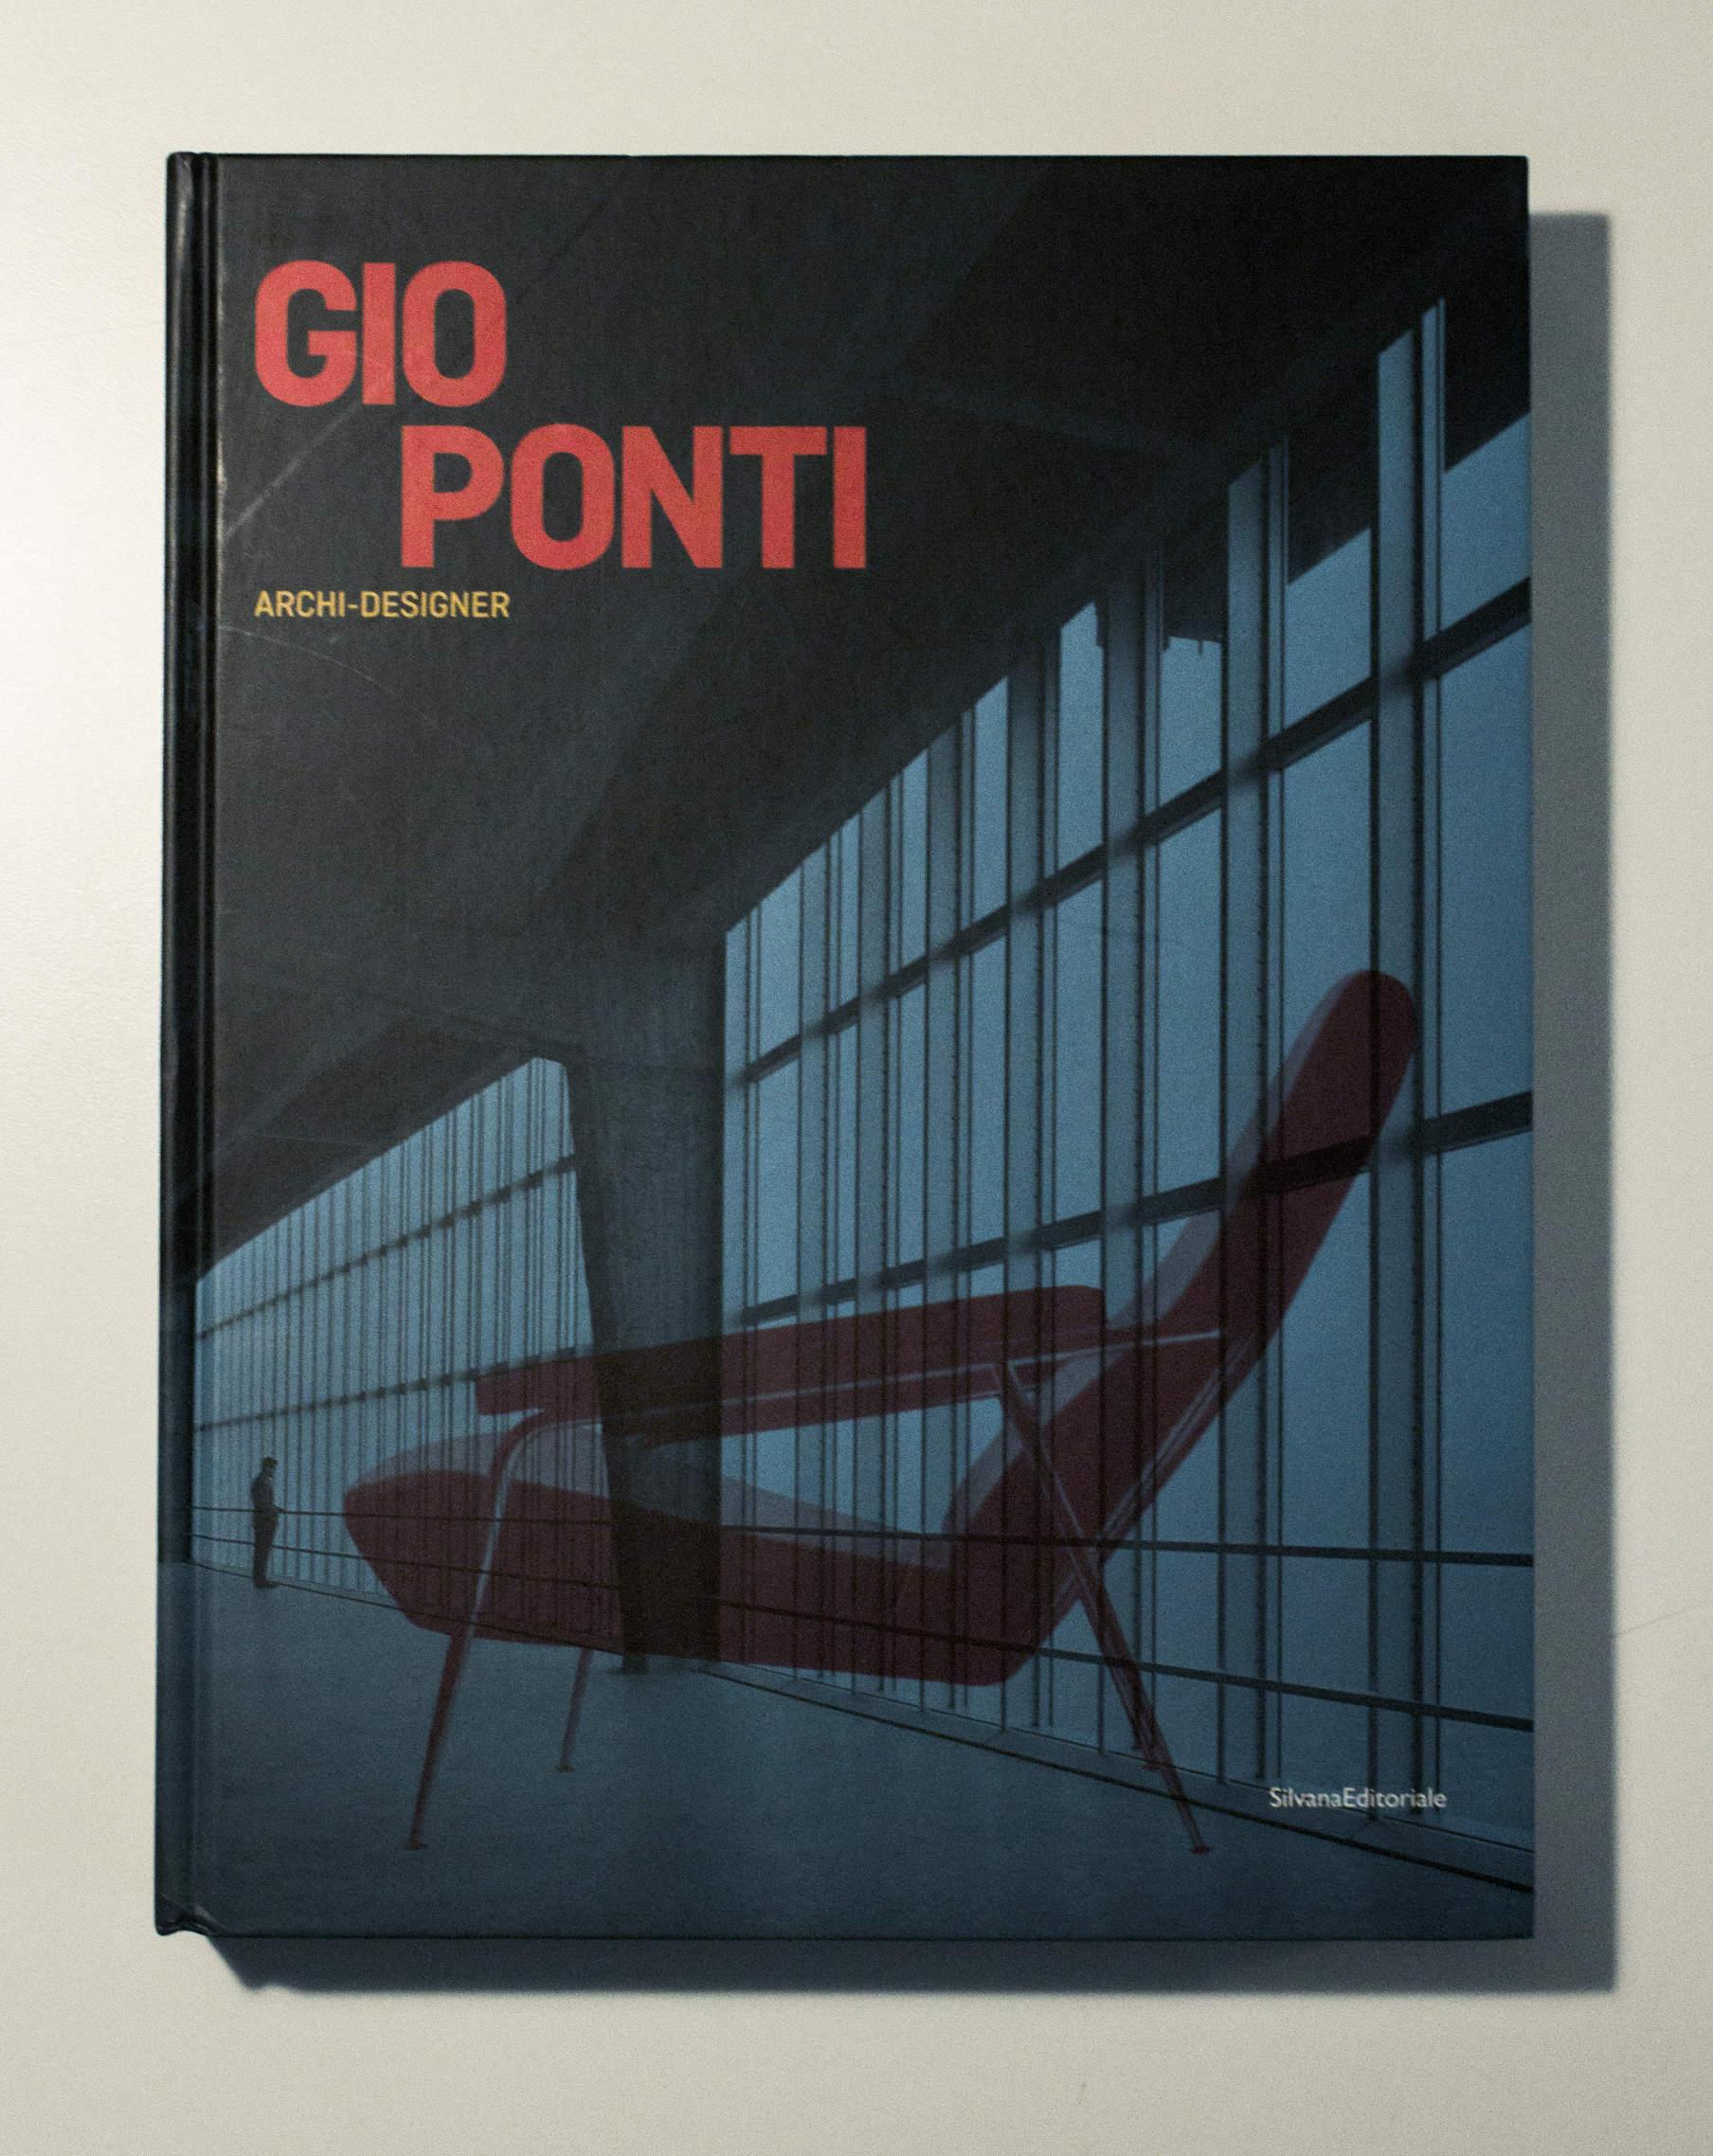 Catalogo Gio Ponti archi-designer